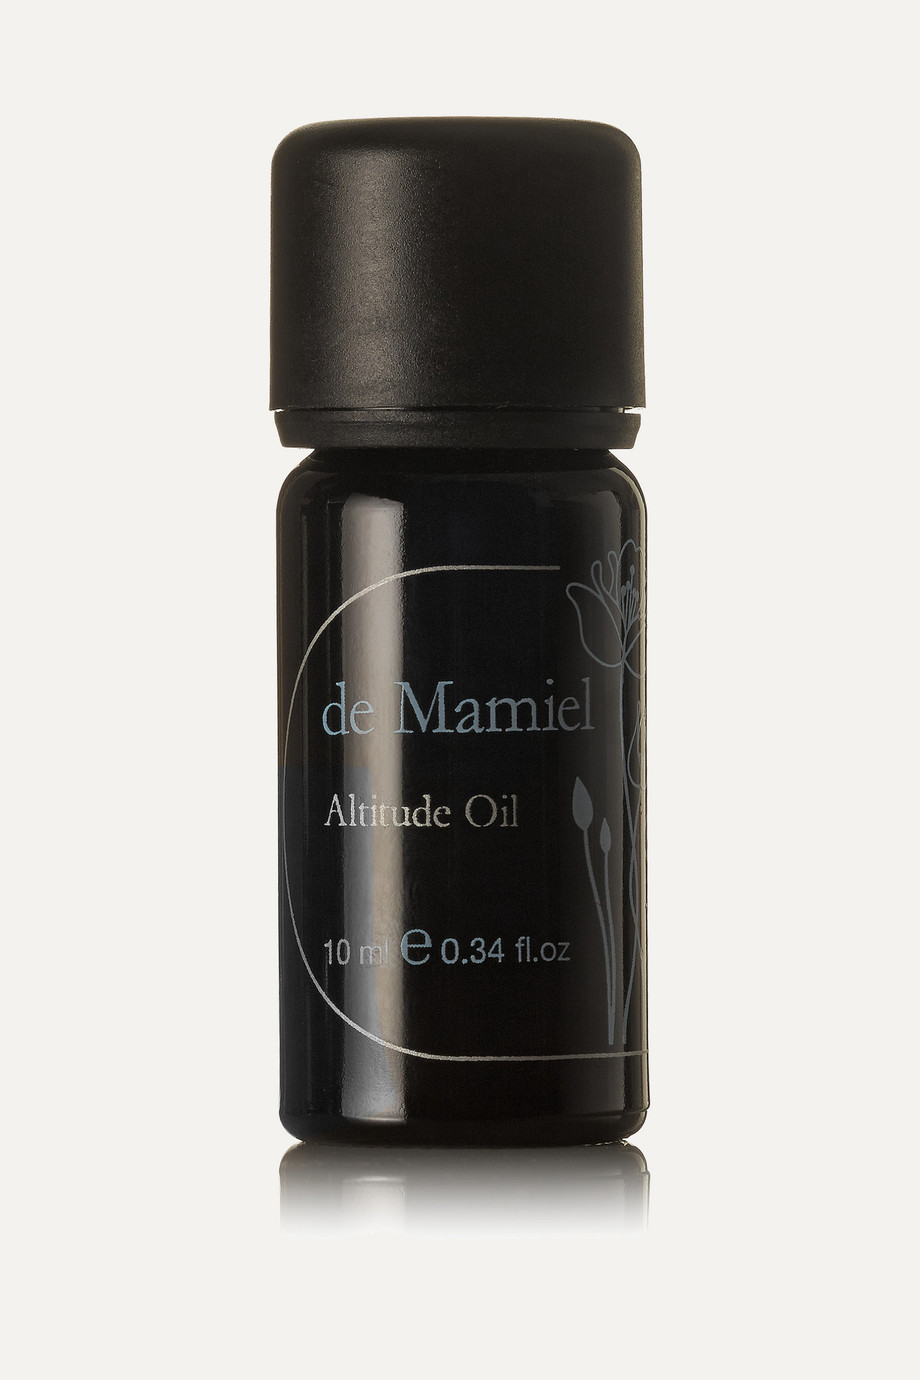 de Mamiel Altitude Oil, 10ml